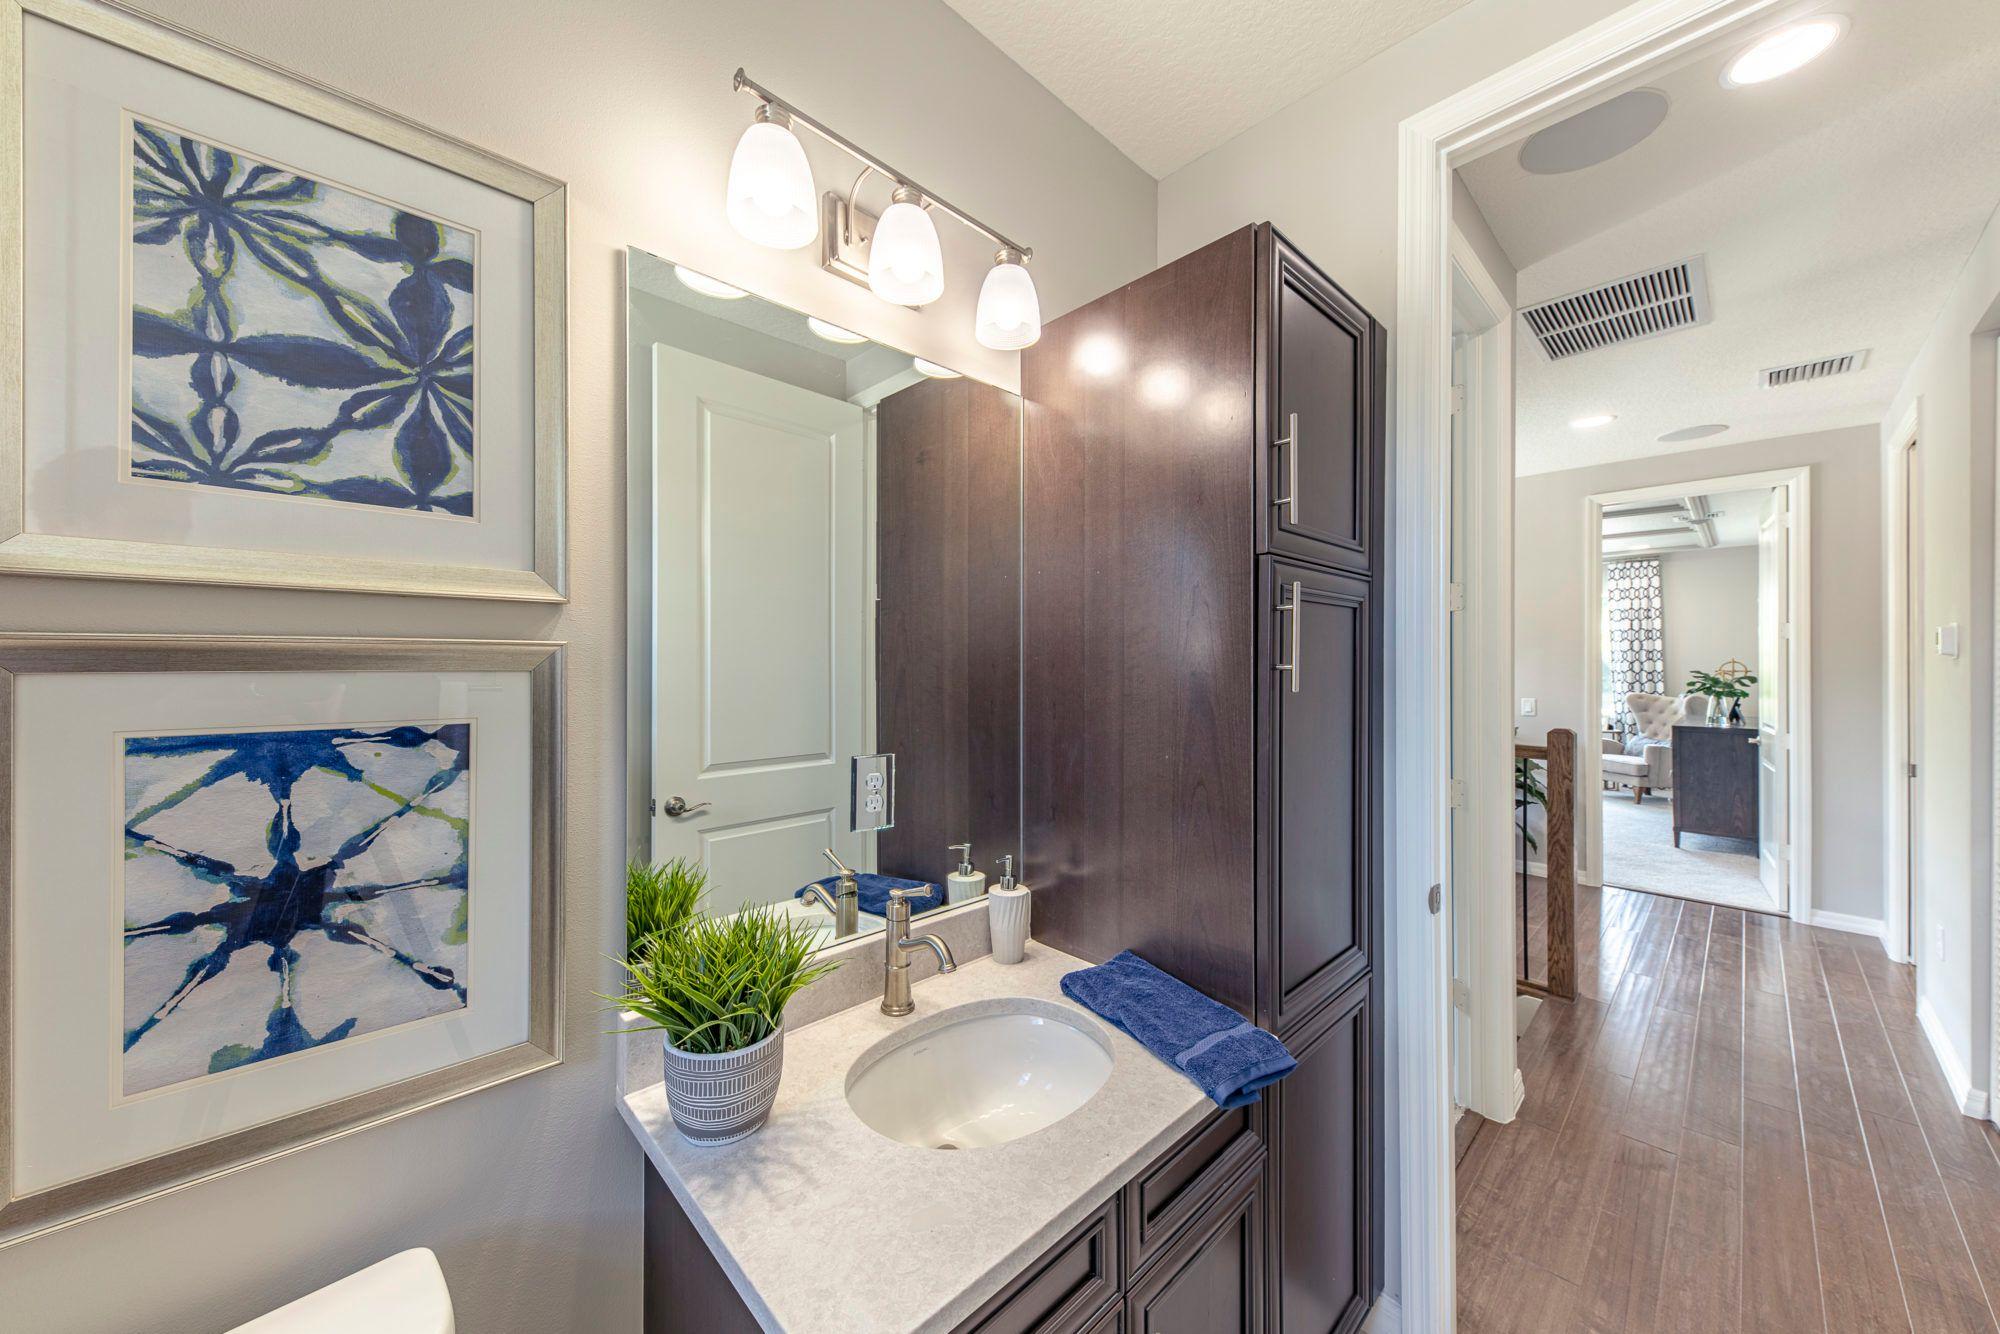 Bathroom featured in the Sophia By 5 Star Development in Palm Beach County, FL